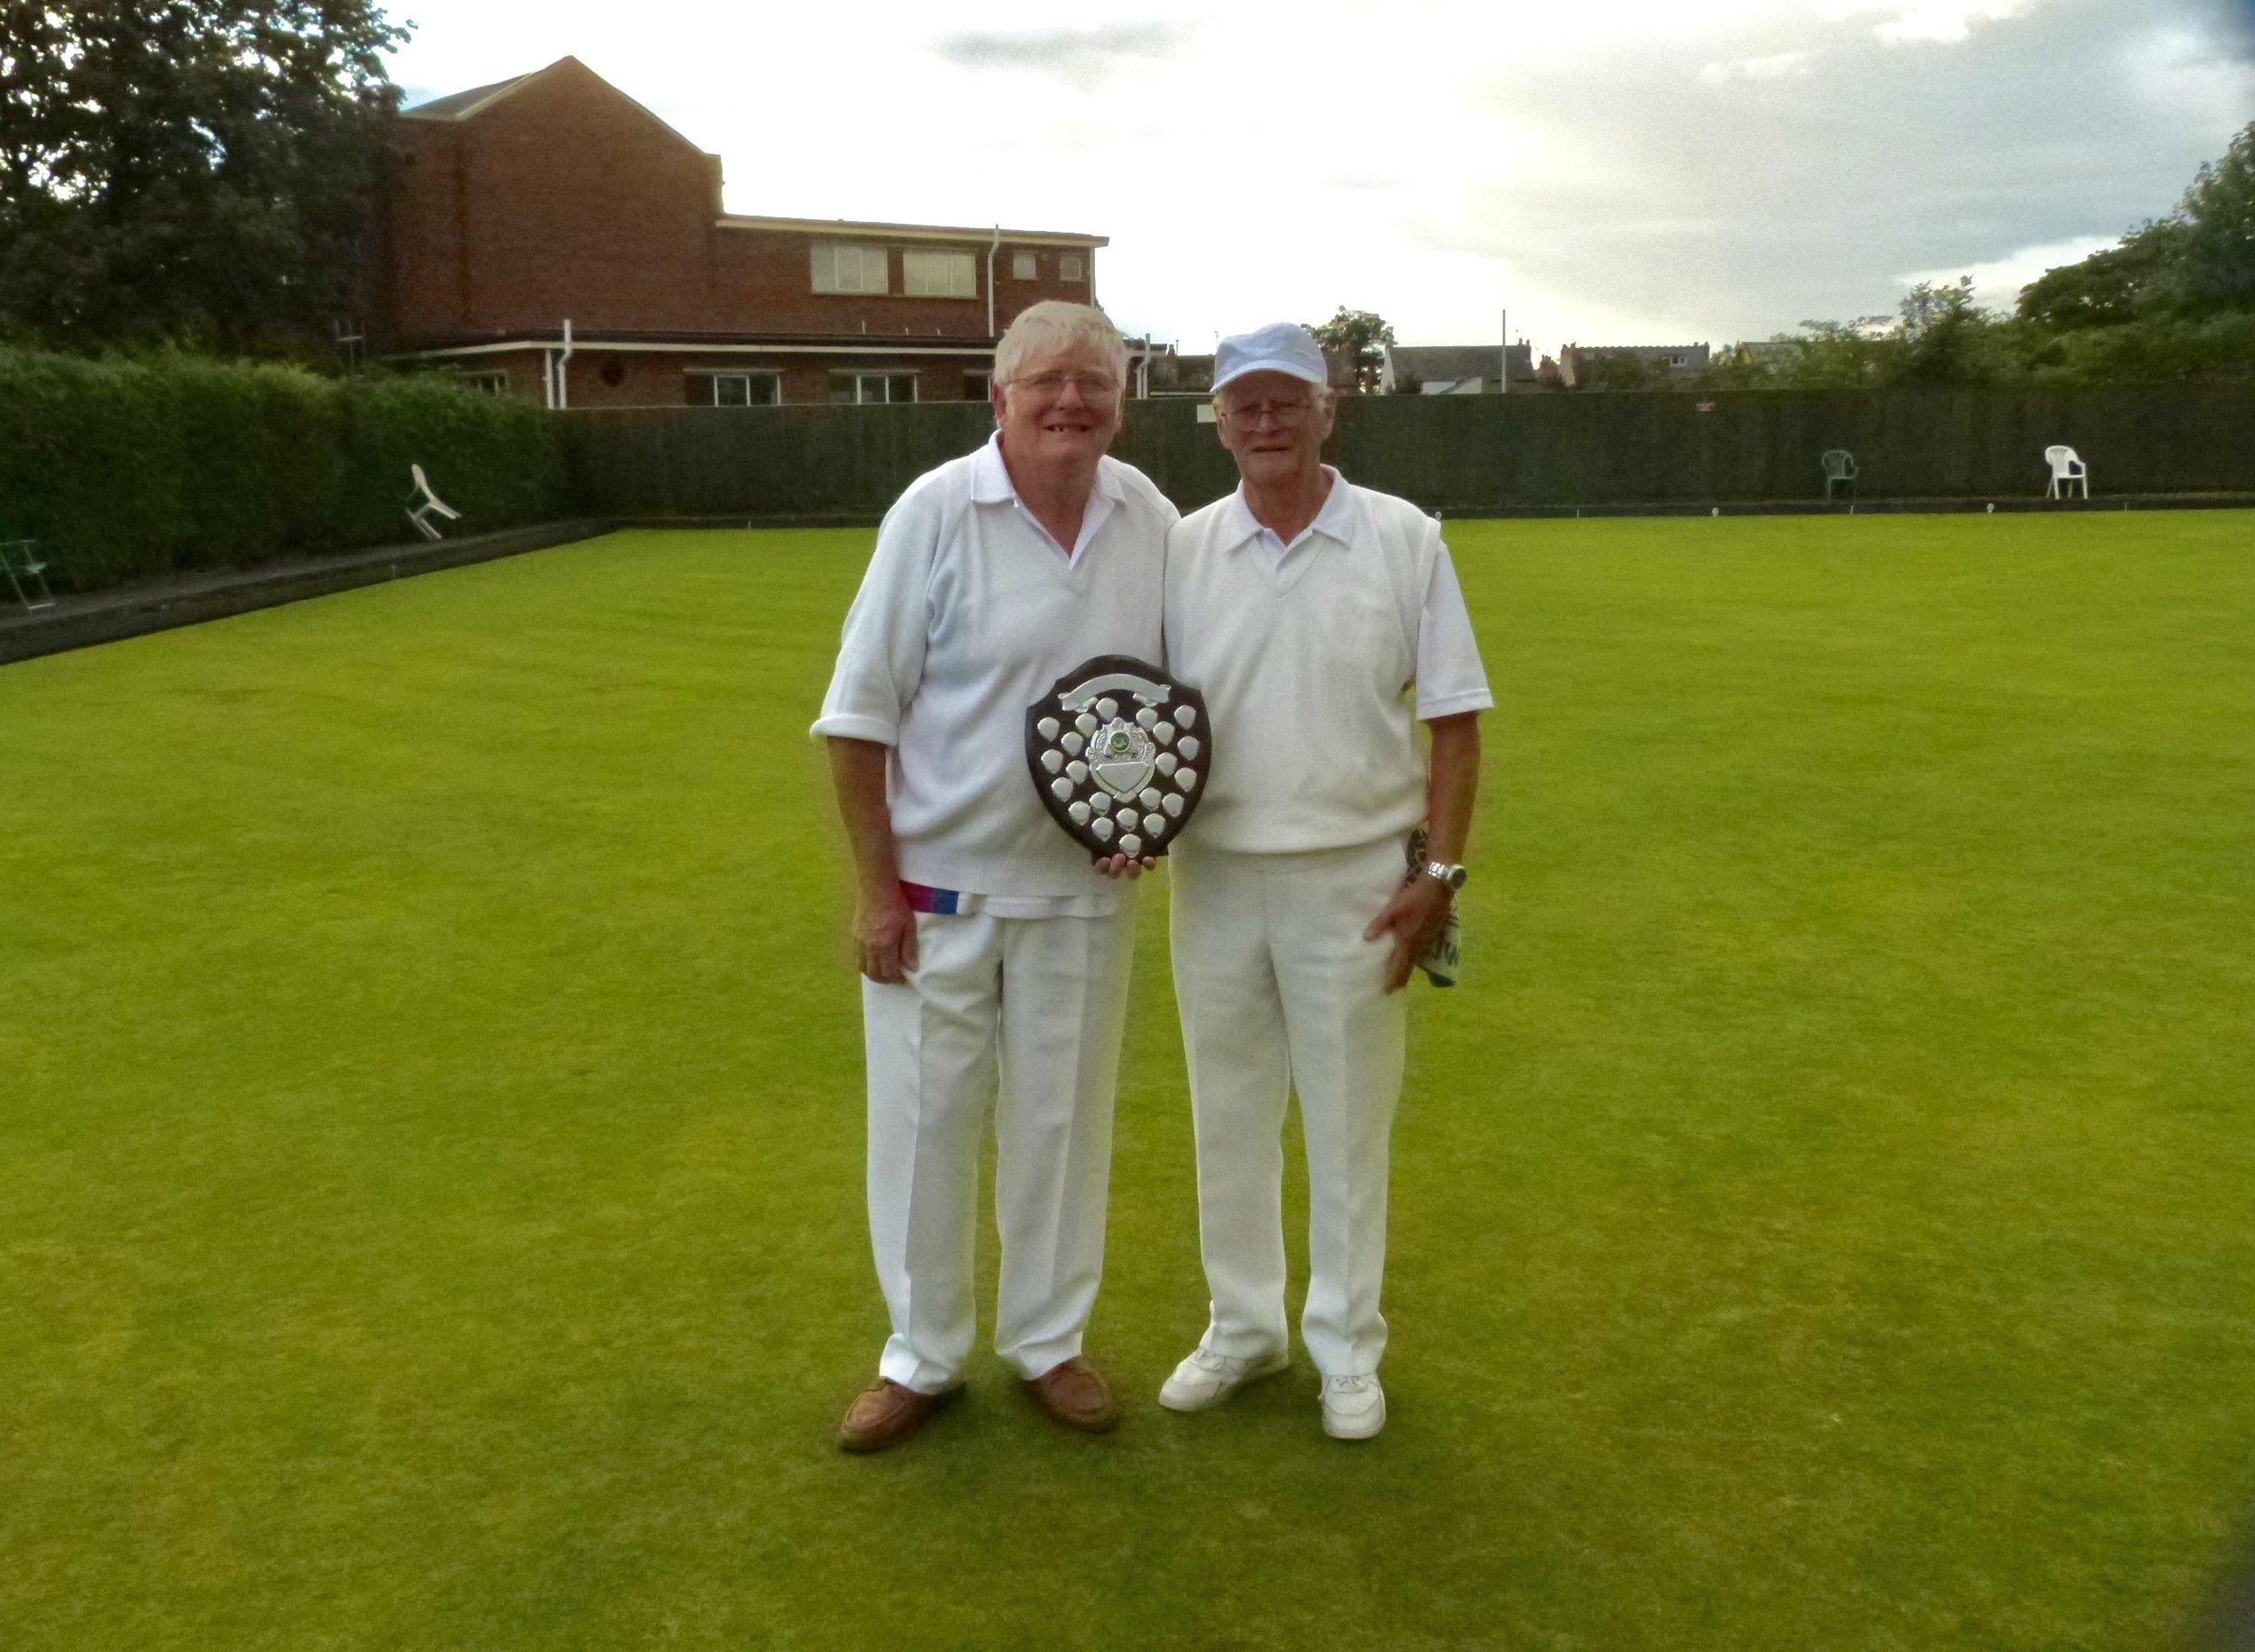 CLUB PAIRS   Winners - Jim Oates & Charles Wallace  Runners Up - Joyce Baker & Sandy Baker